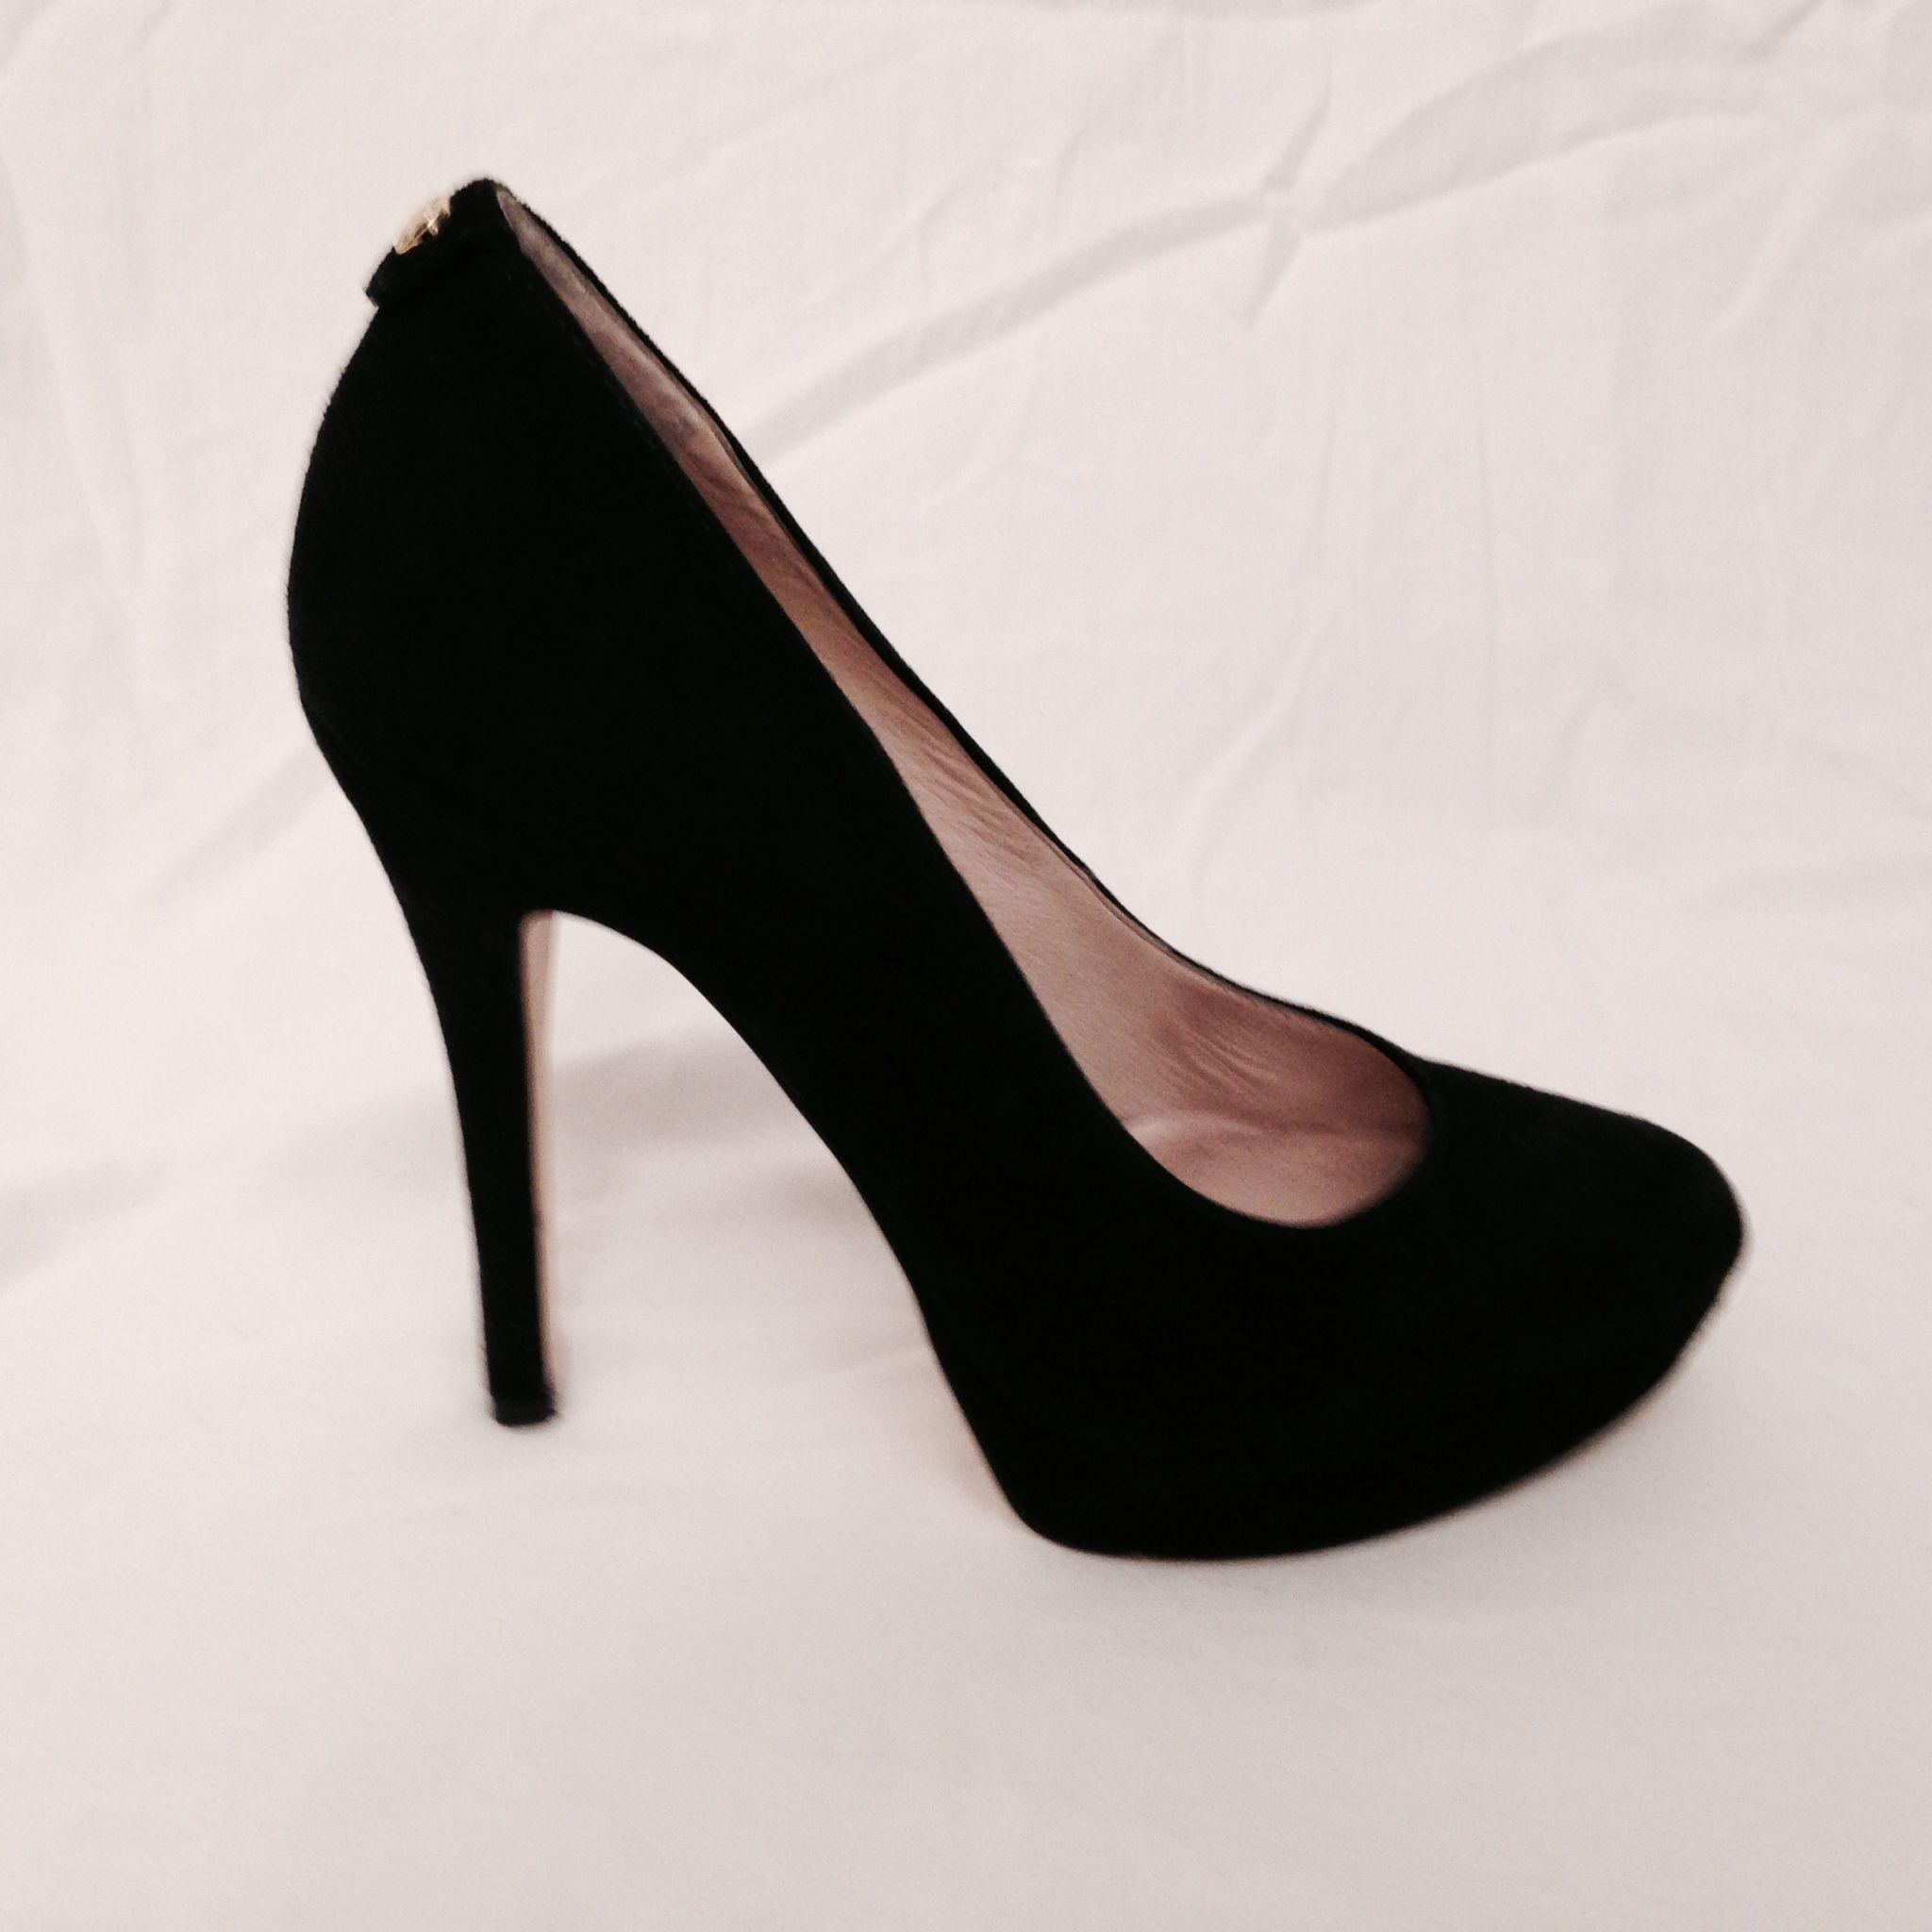 Michael KORS Platform Black Suede Heels — Refashionista Boutique